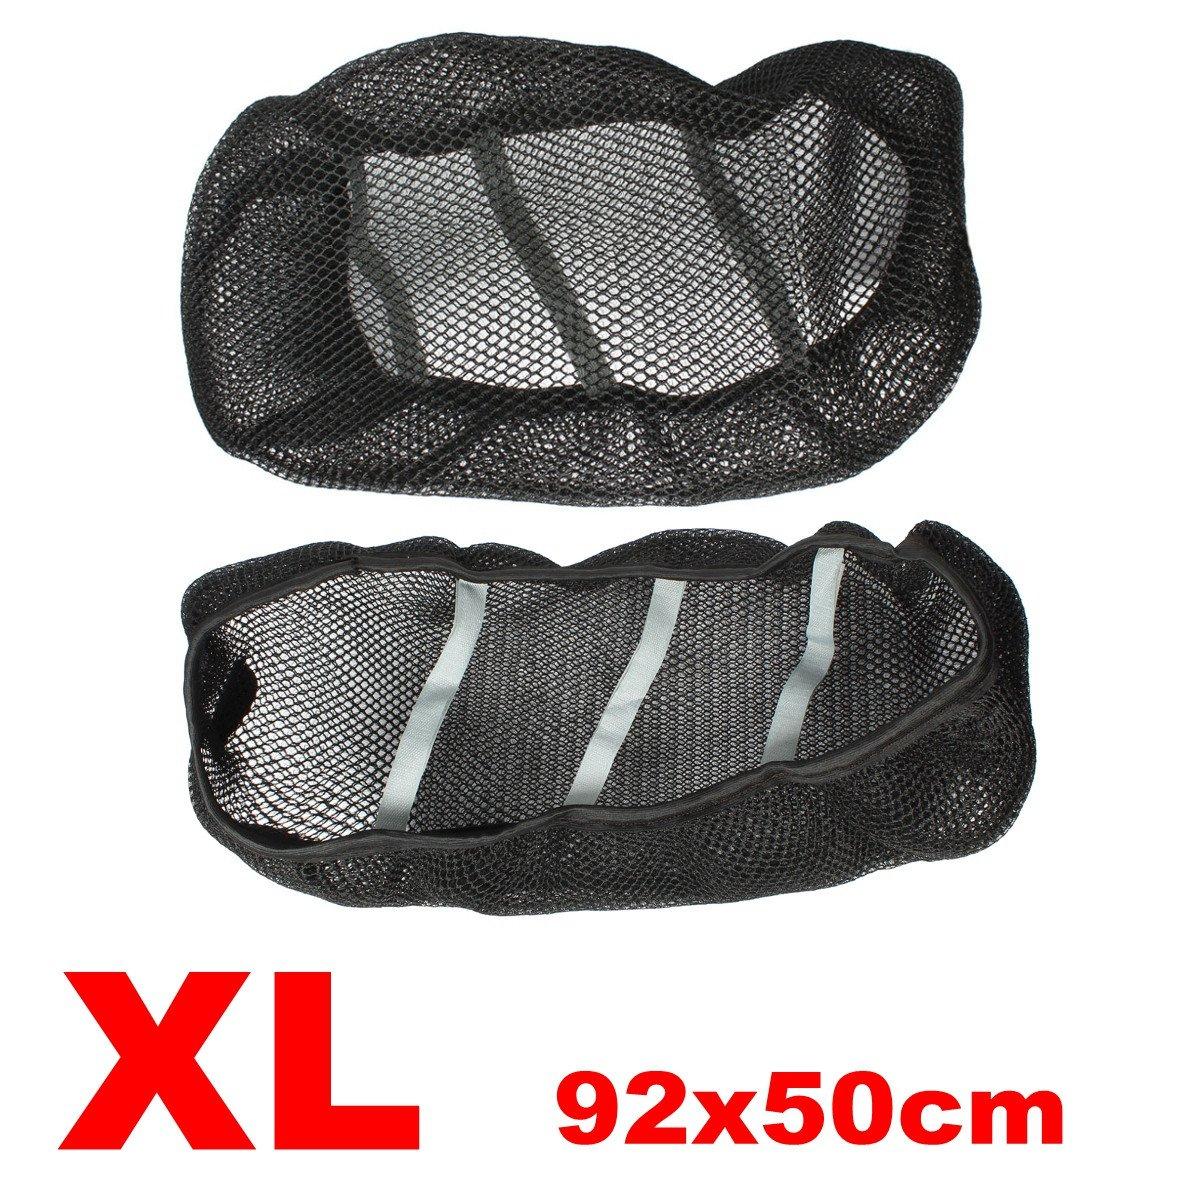 Wooya 3D Moto Scooter Coprisella Net Traspirante Protector Black-XXL